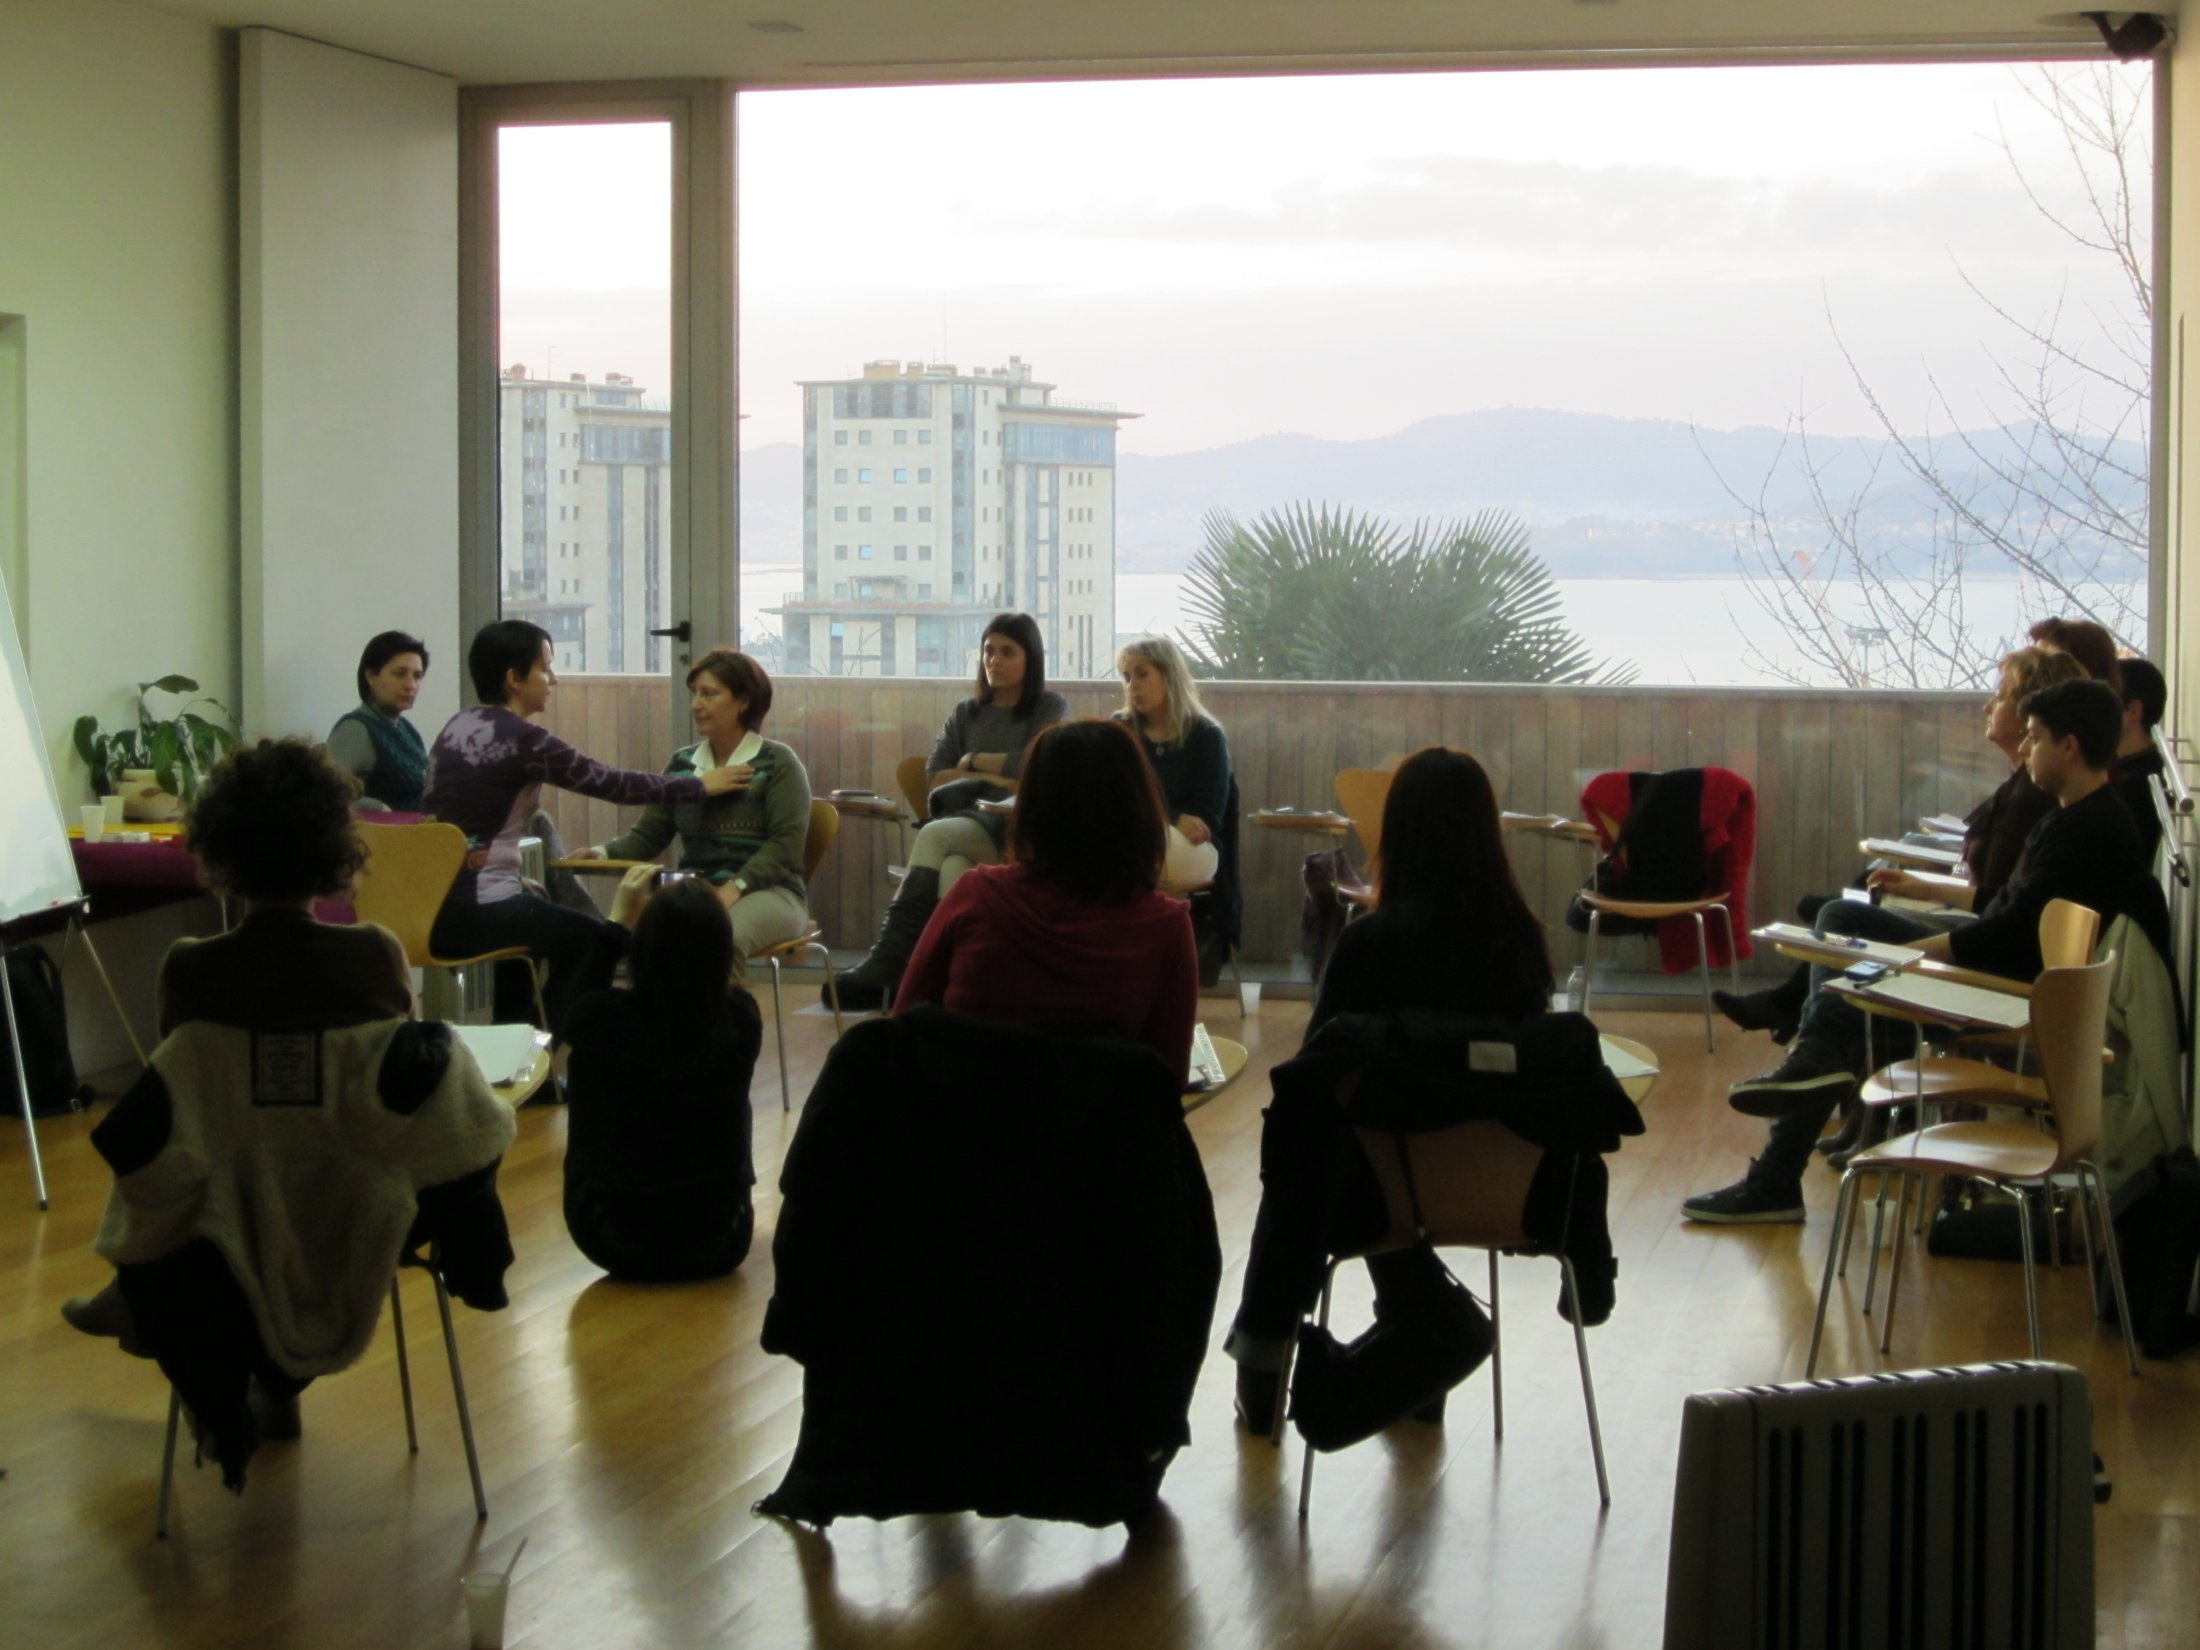 Curso EFT Tapping febrero 2012